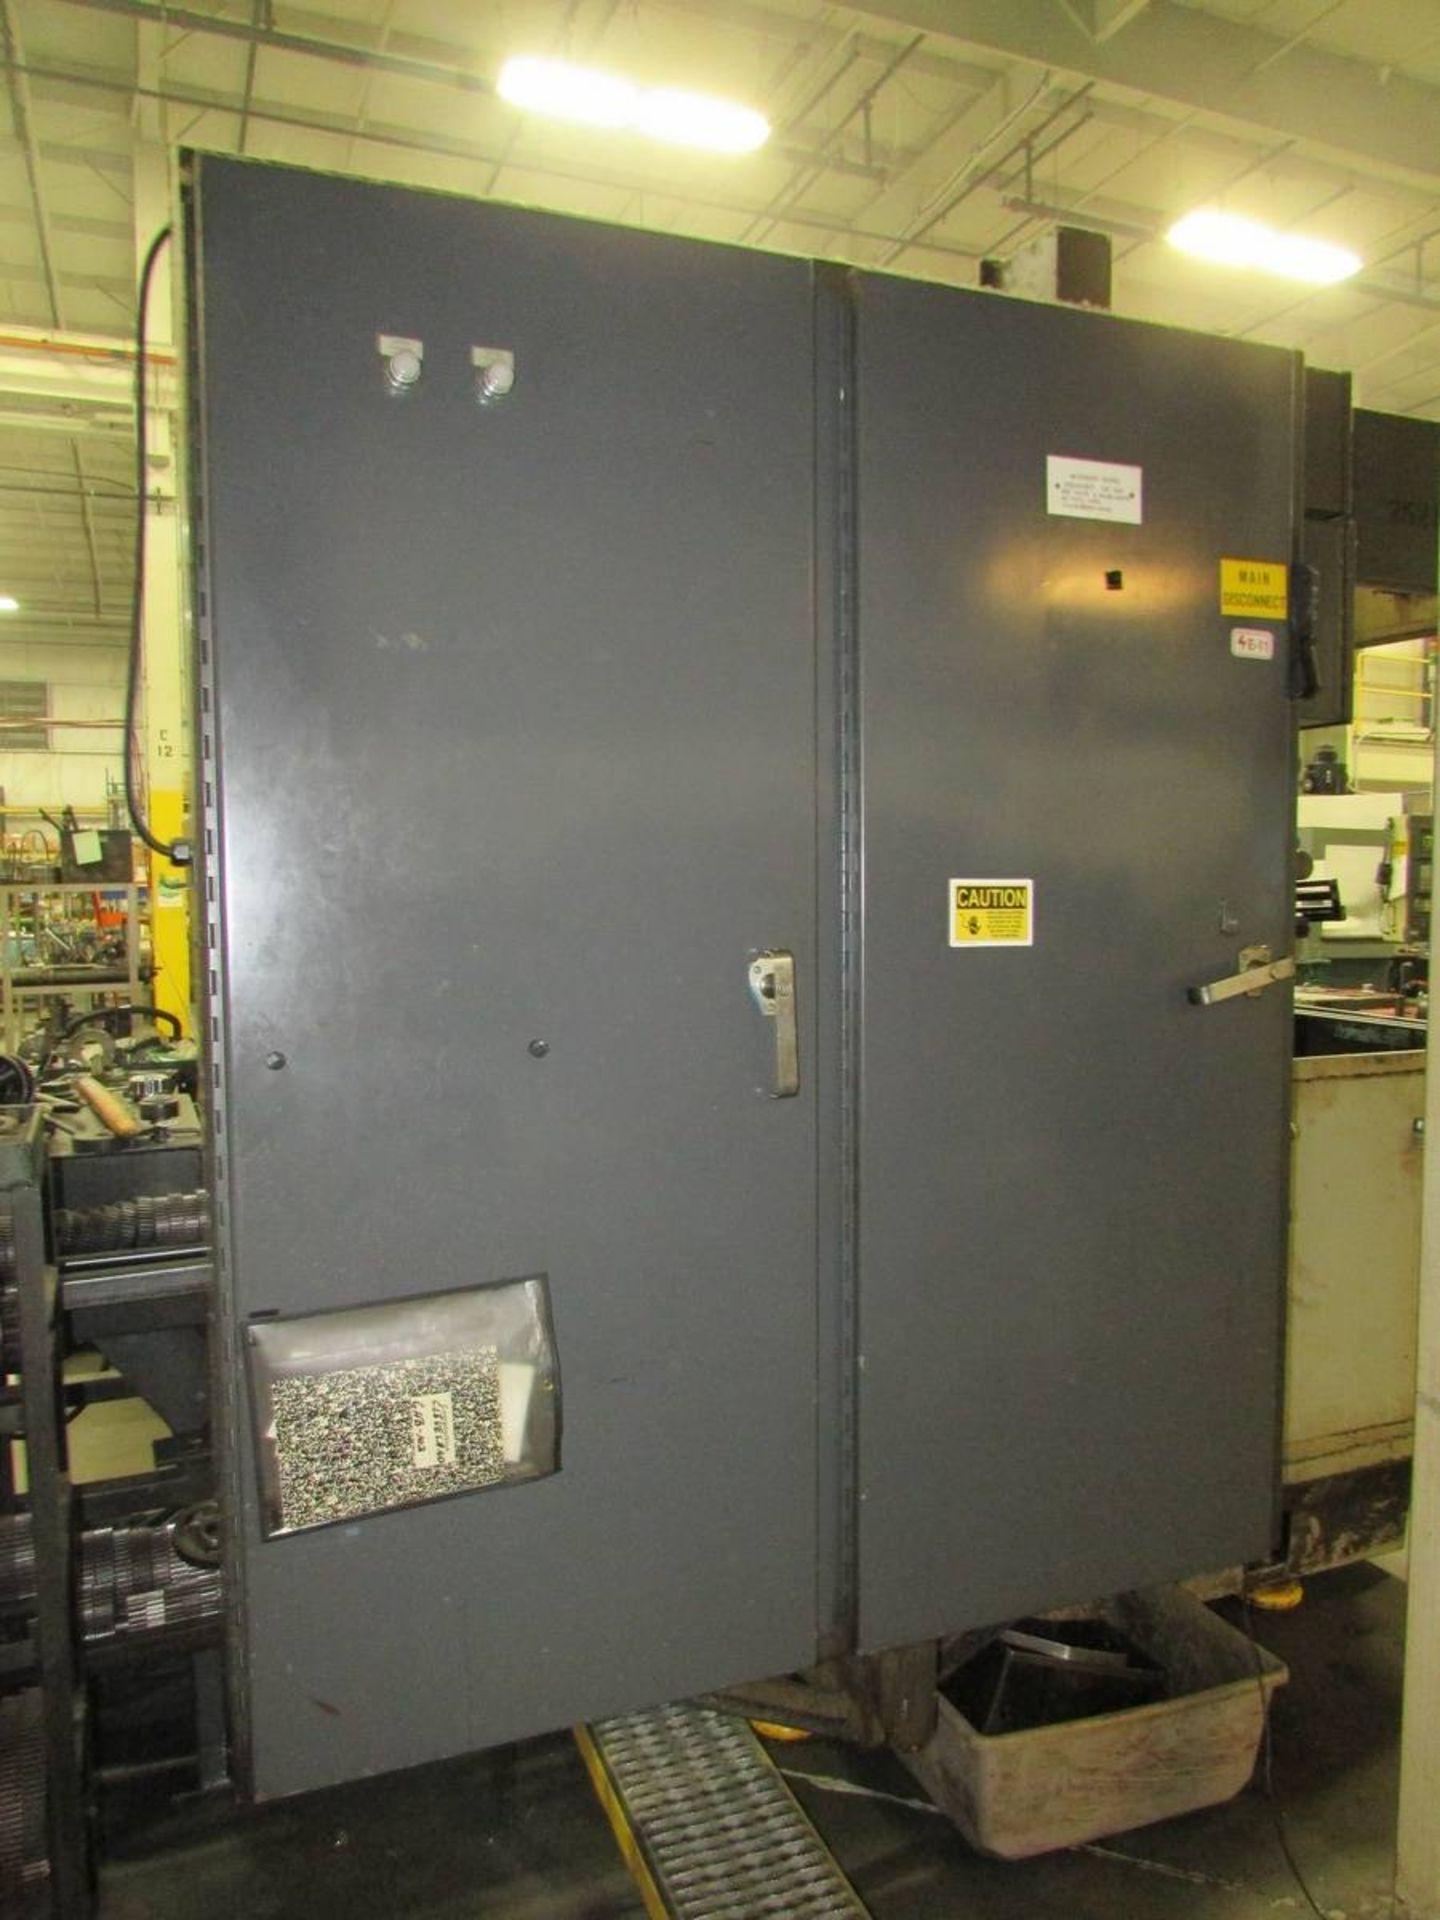 Cleveland/ Waterbury Farrel CR300-612-002 Universal CNC Gear Hobbing Machine - Image 16 of 19